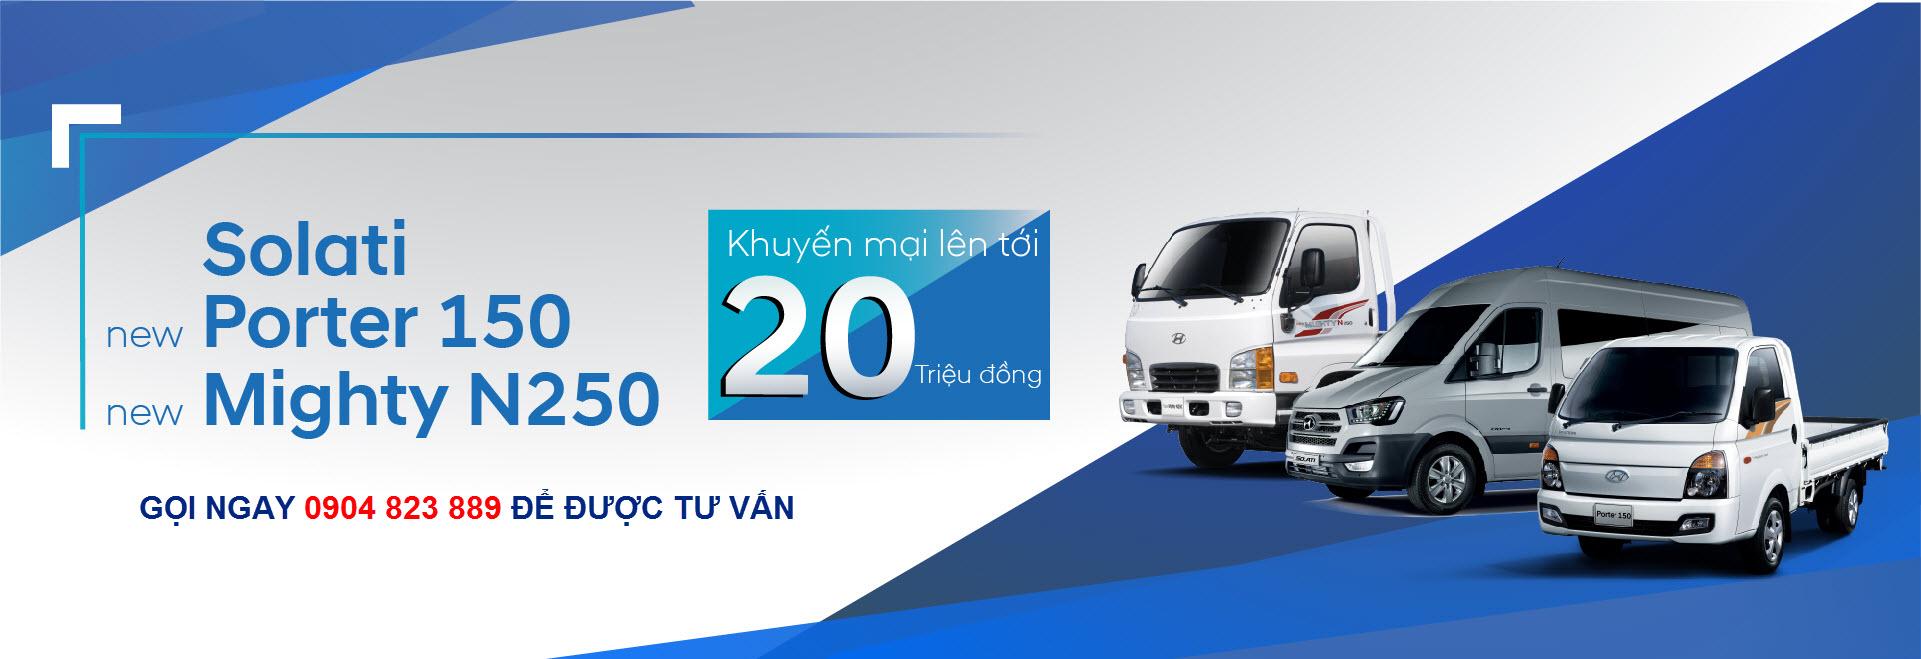 Hyundai Solati 16 chỗ